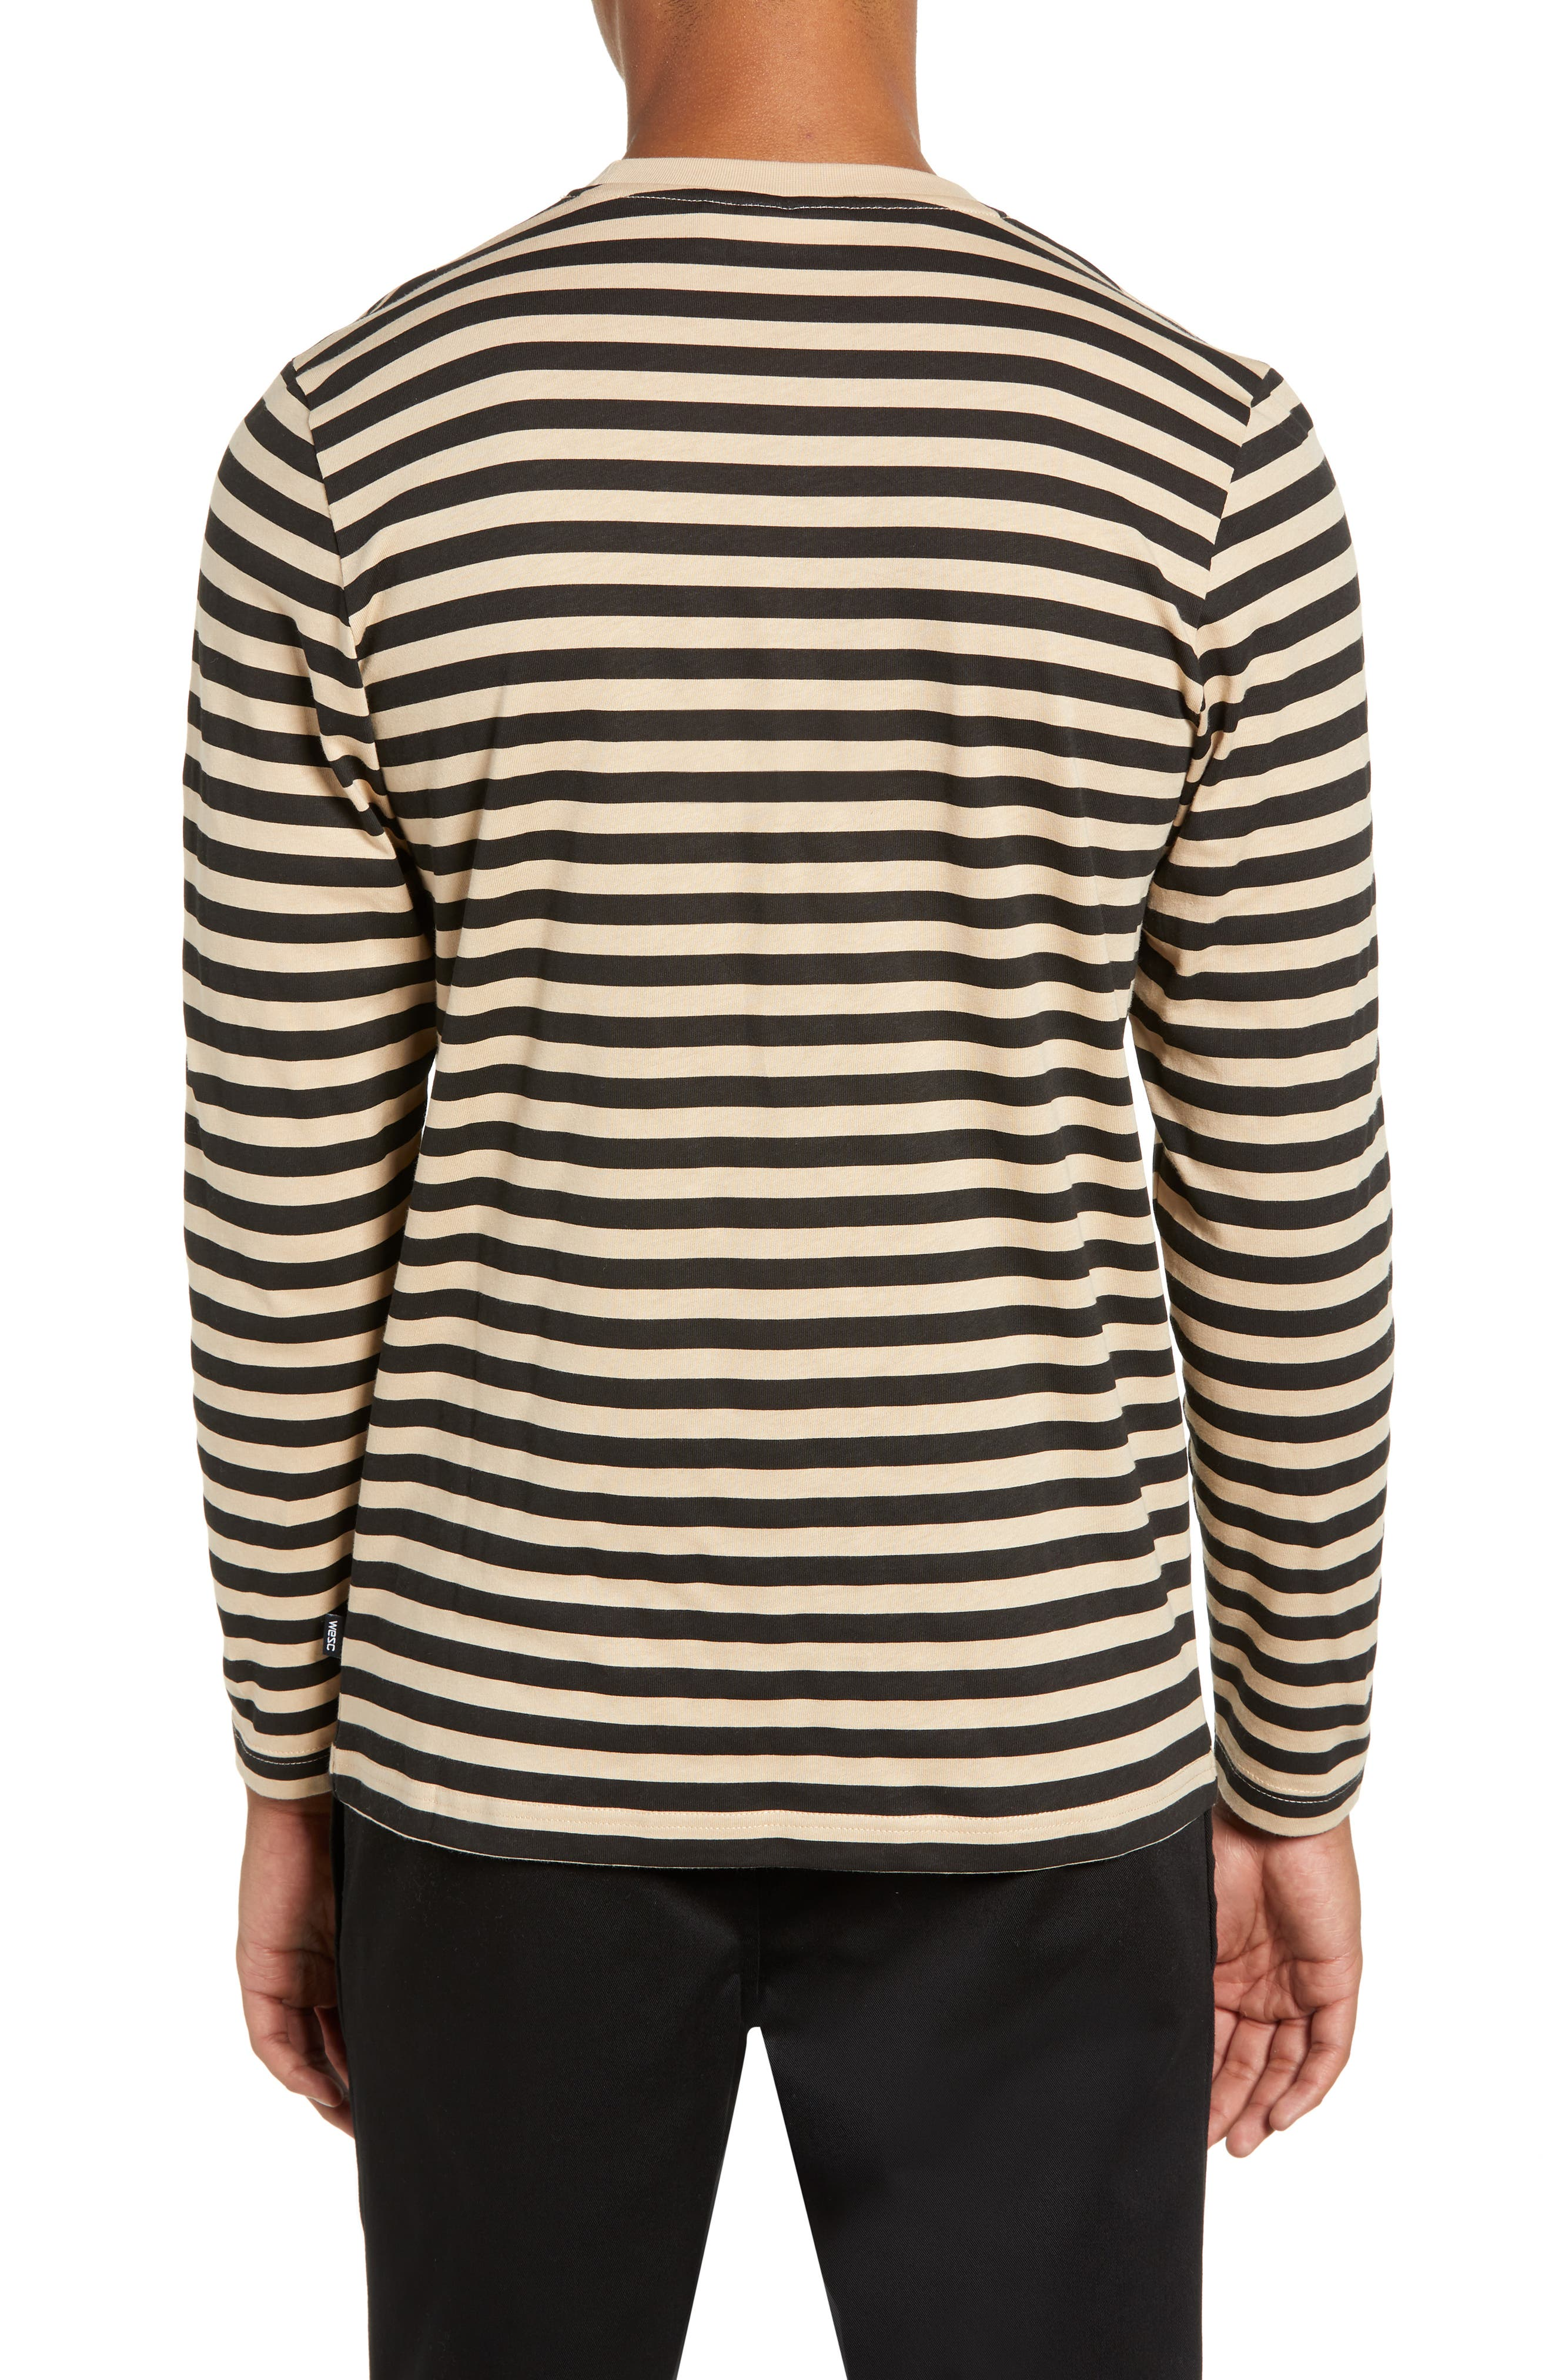 Makai Stripe Long Sleeve Pocket T-Shirt,                             Alternate thumbnail 2, color,                             271